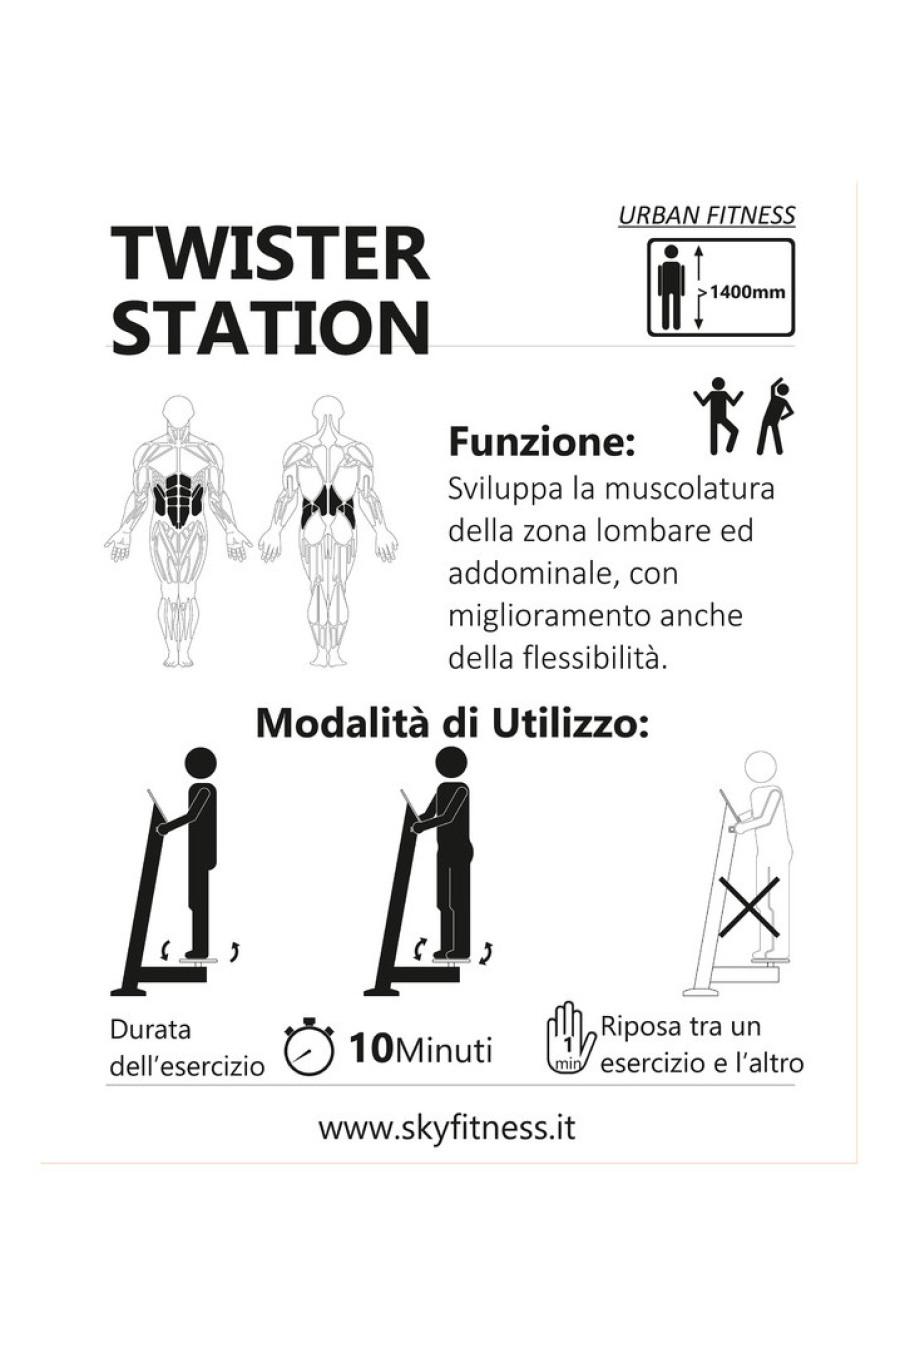 twister-station